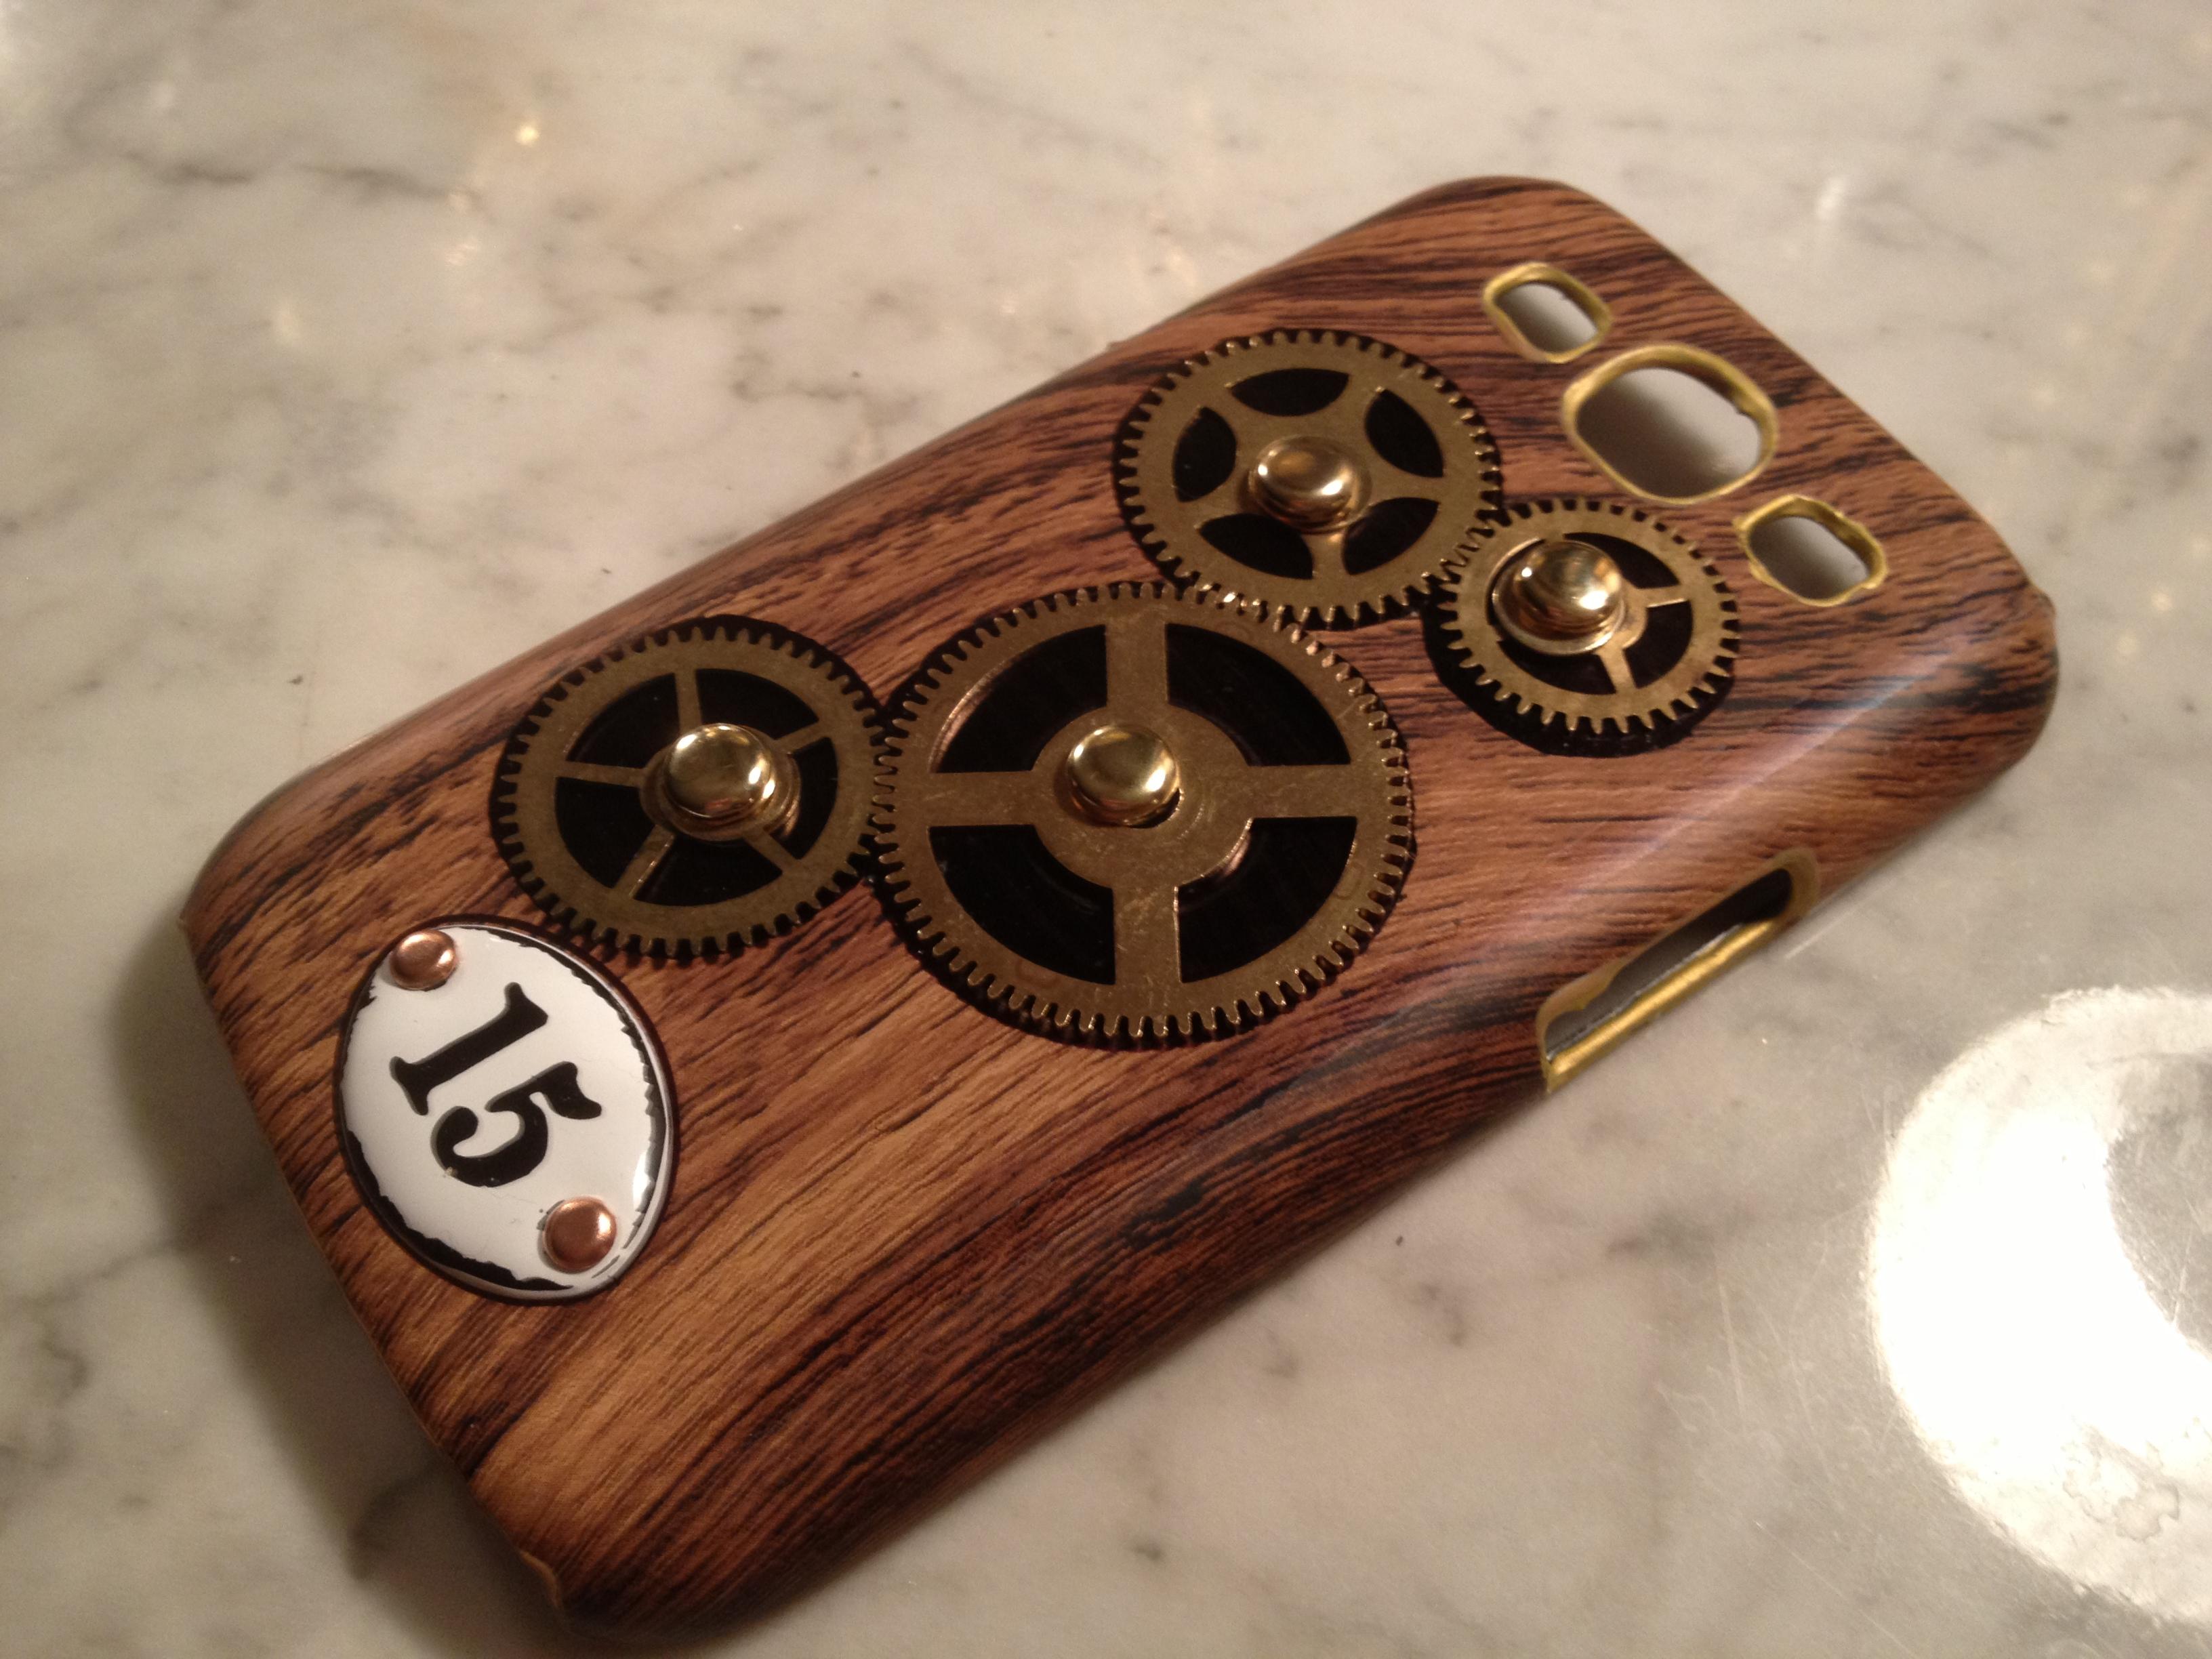 i_gearz_samsung_galaxy_s3_steampunk_phone_case_gear_spin_phone_cases_5.jpg